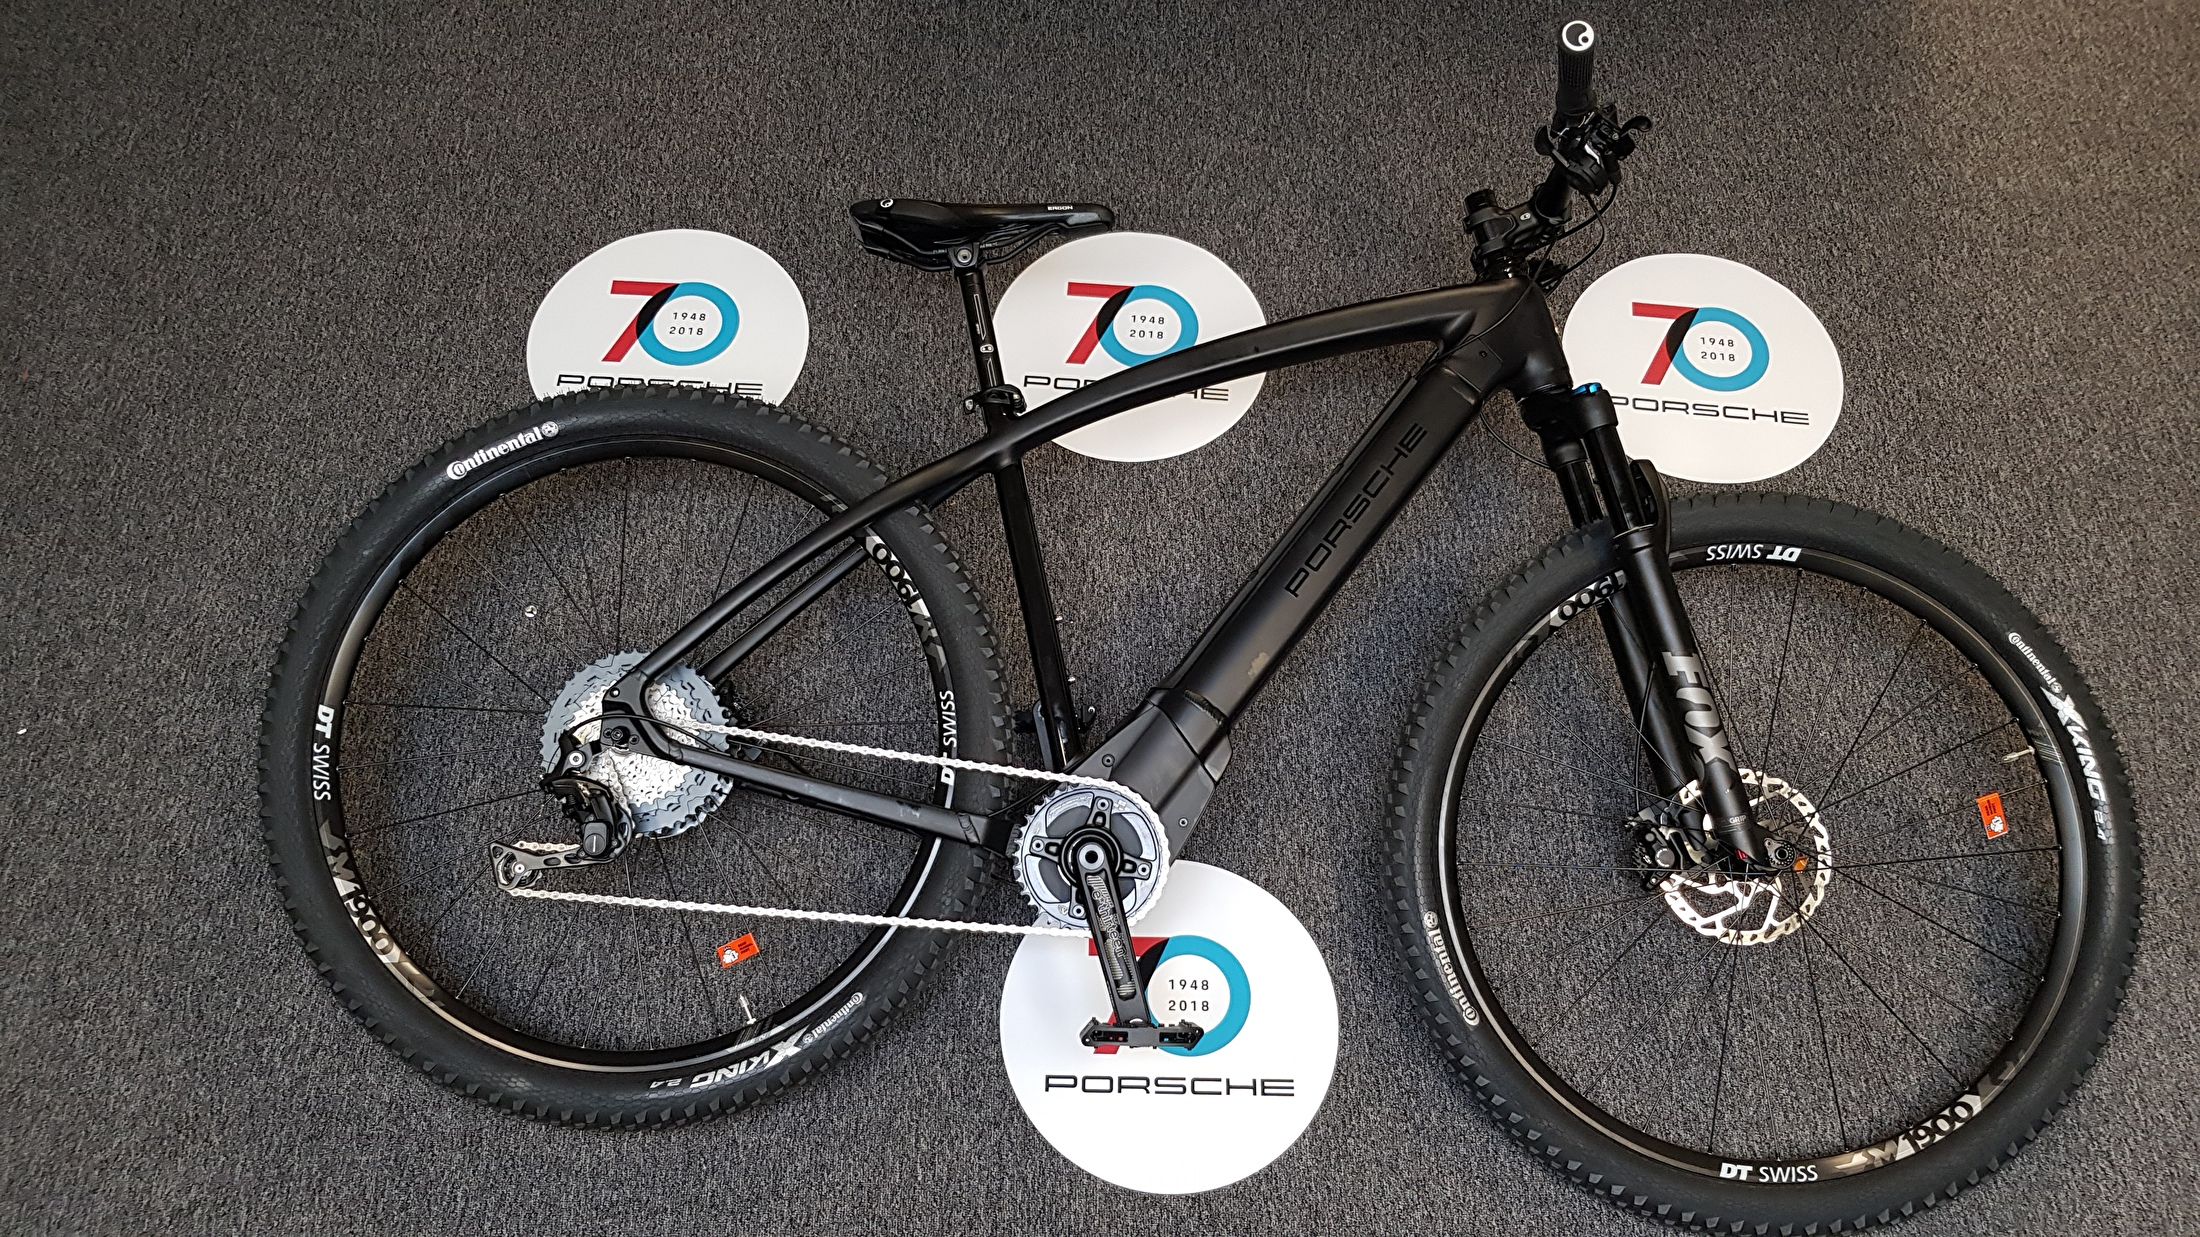 PORSCHE E-Bike MTB Rotwild Limited Edition 70 Jahre.